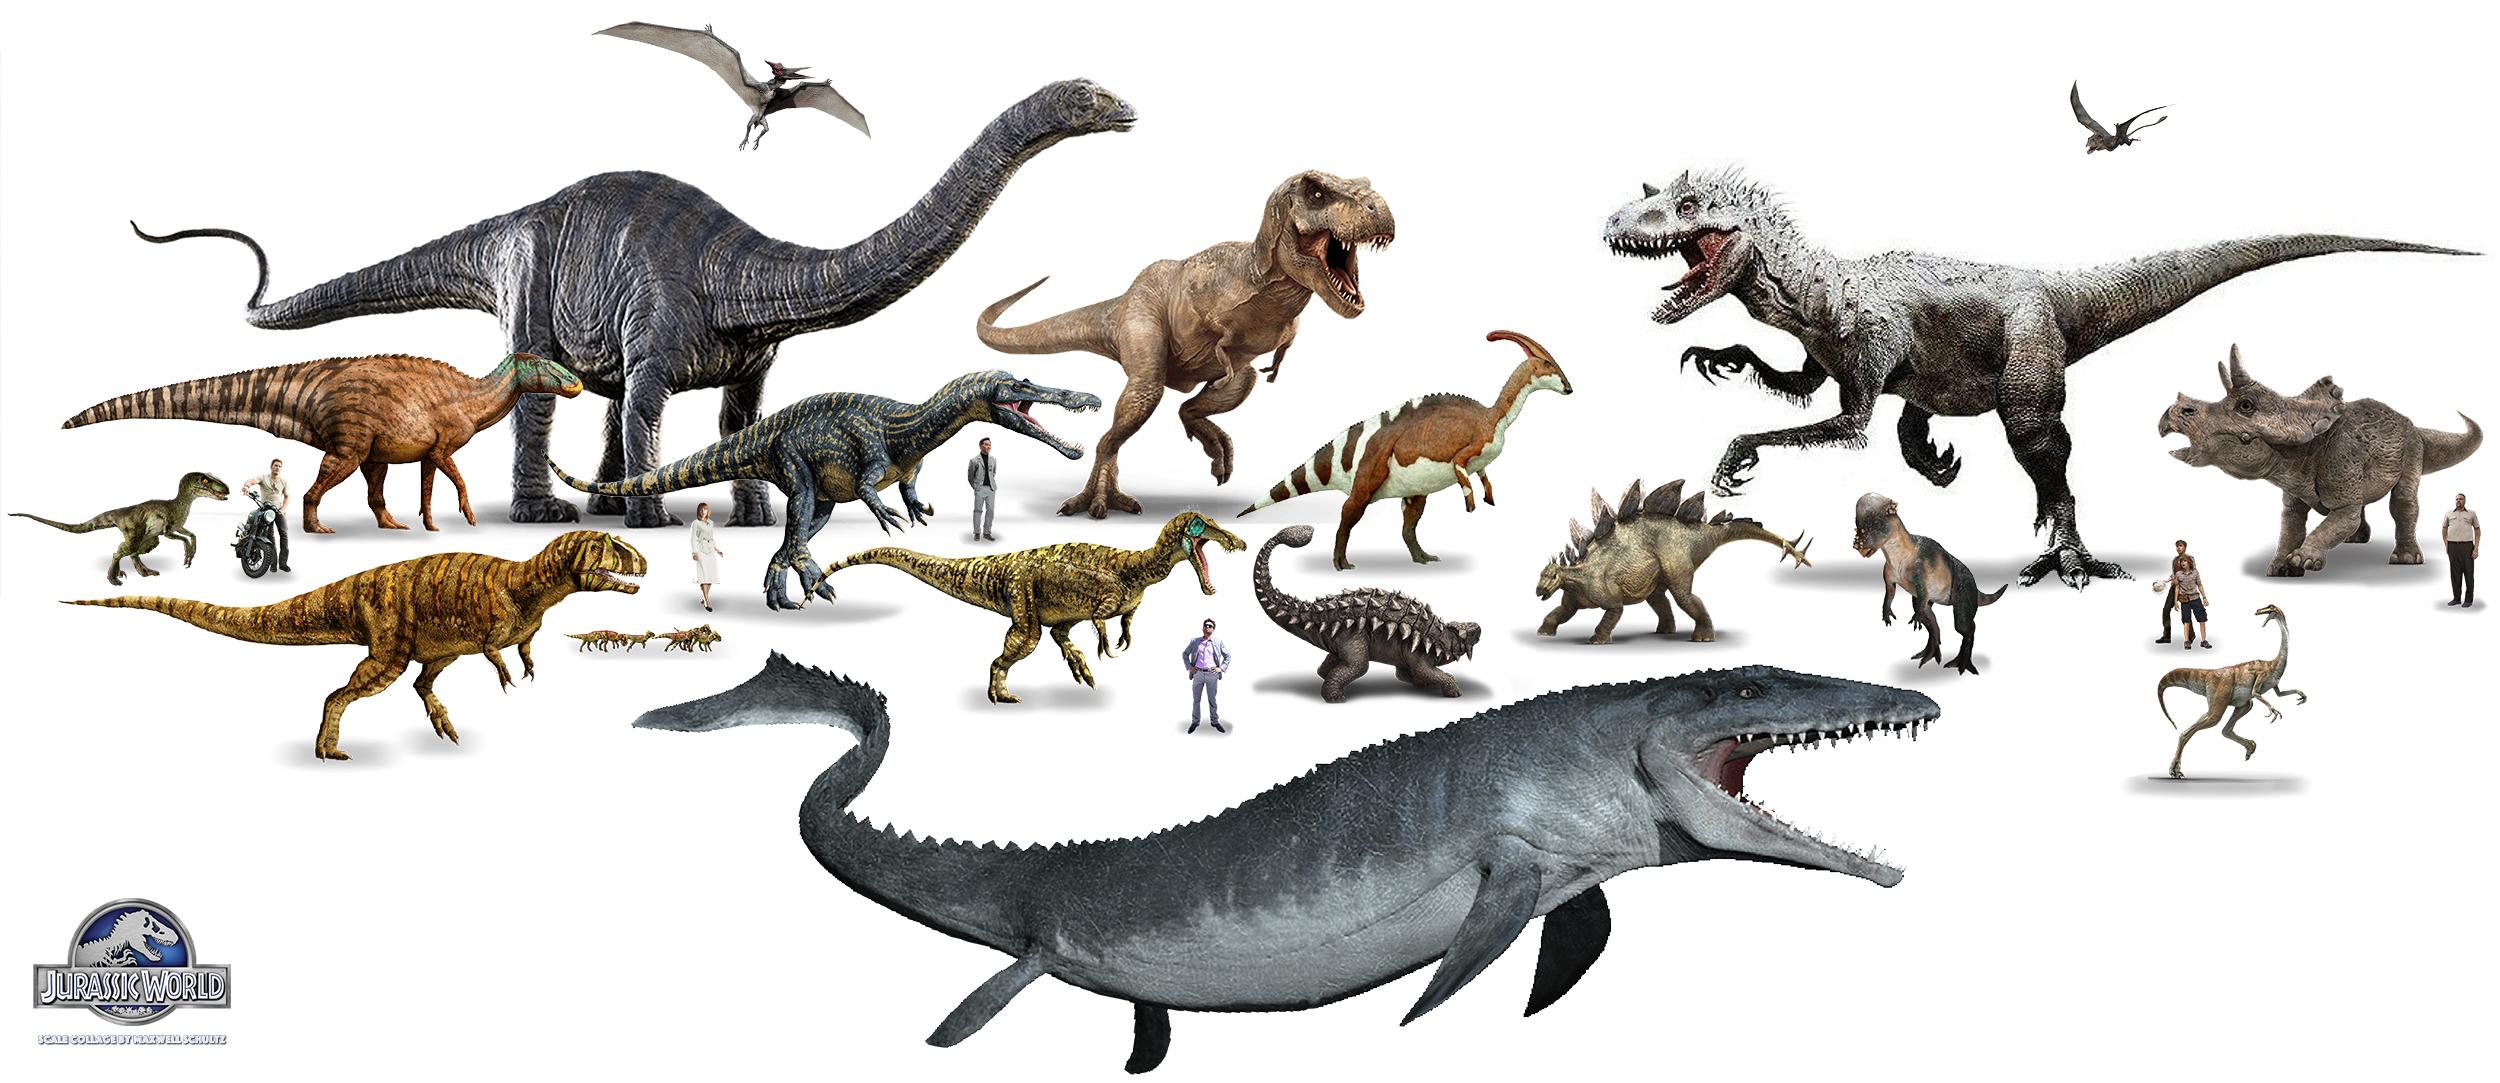 Jurassic world by urbnvampslayer on deviantart - Dinosaure jurassic world ...